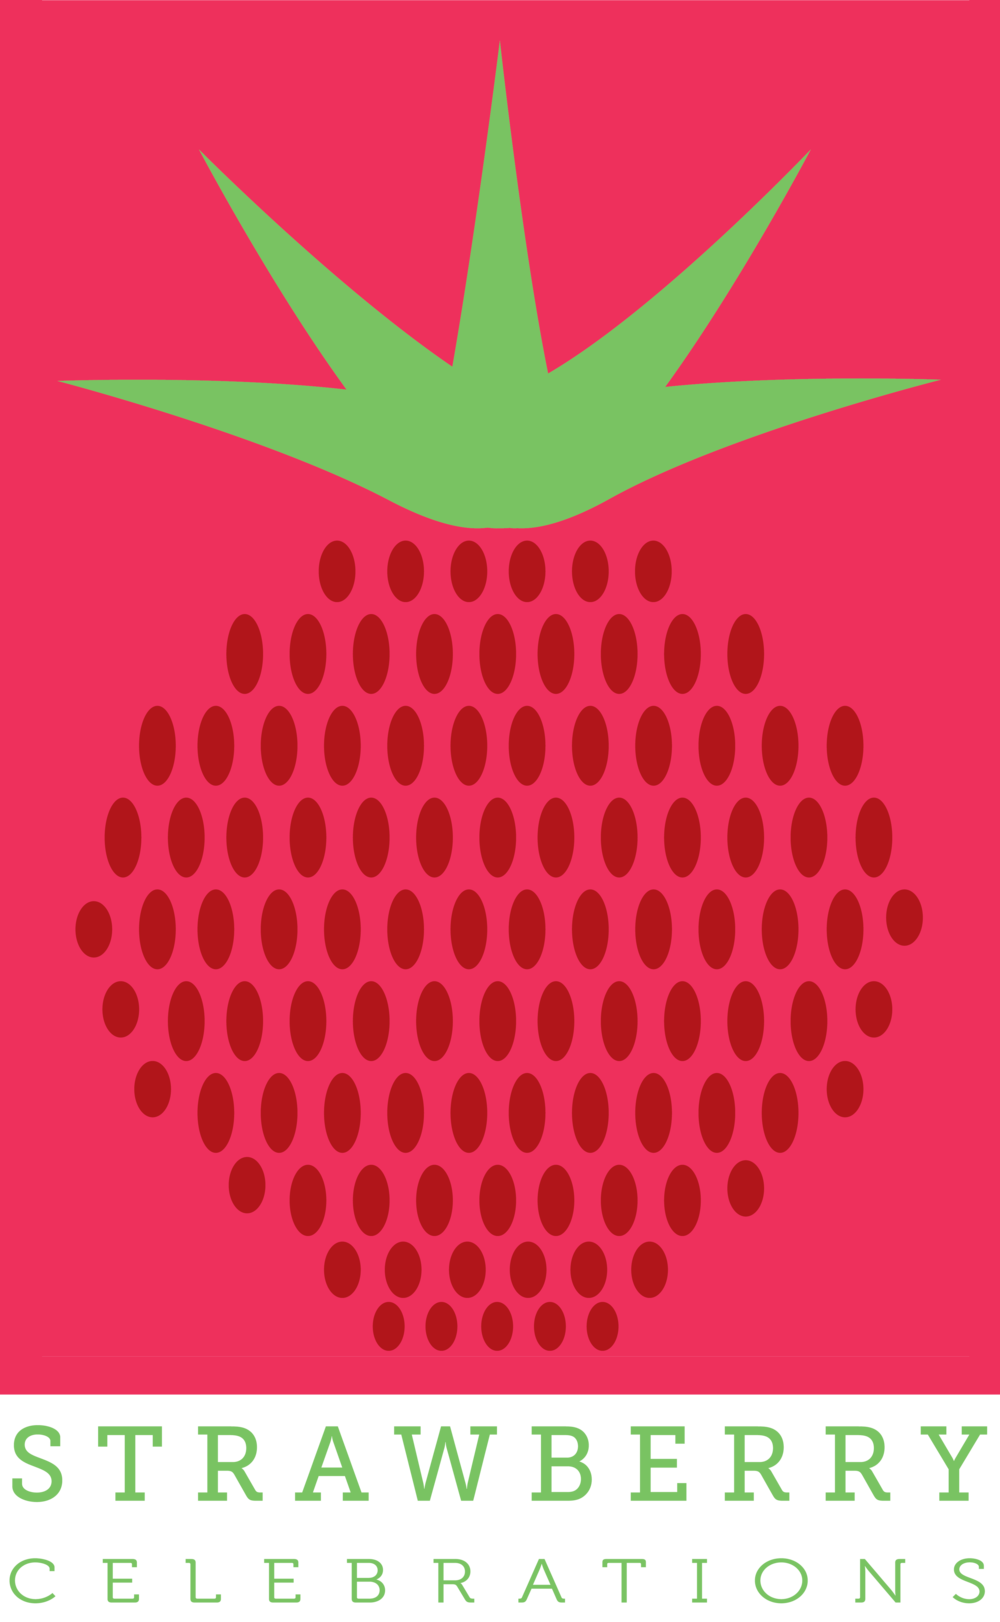 strawberrycelebrations6-8-17.png